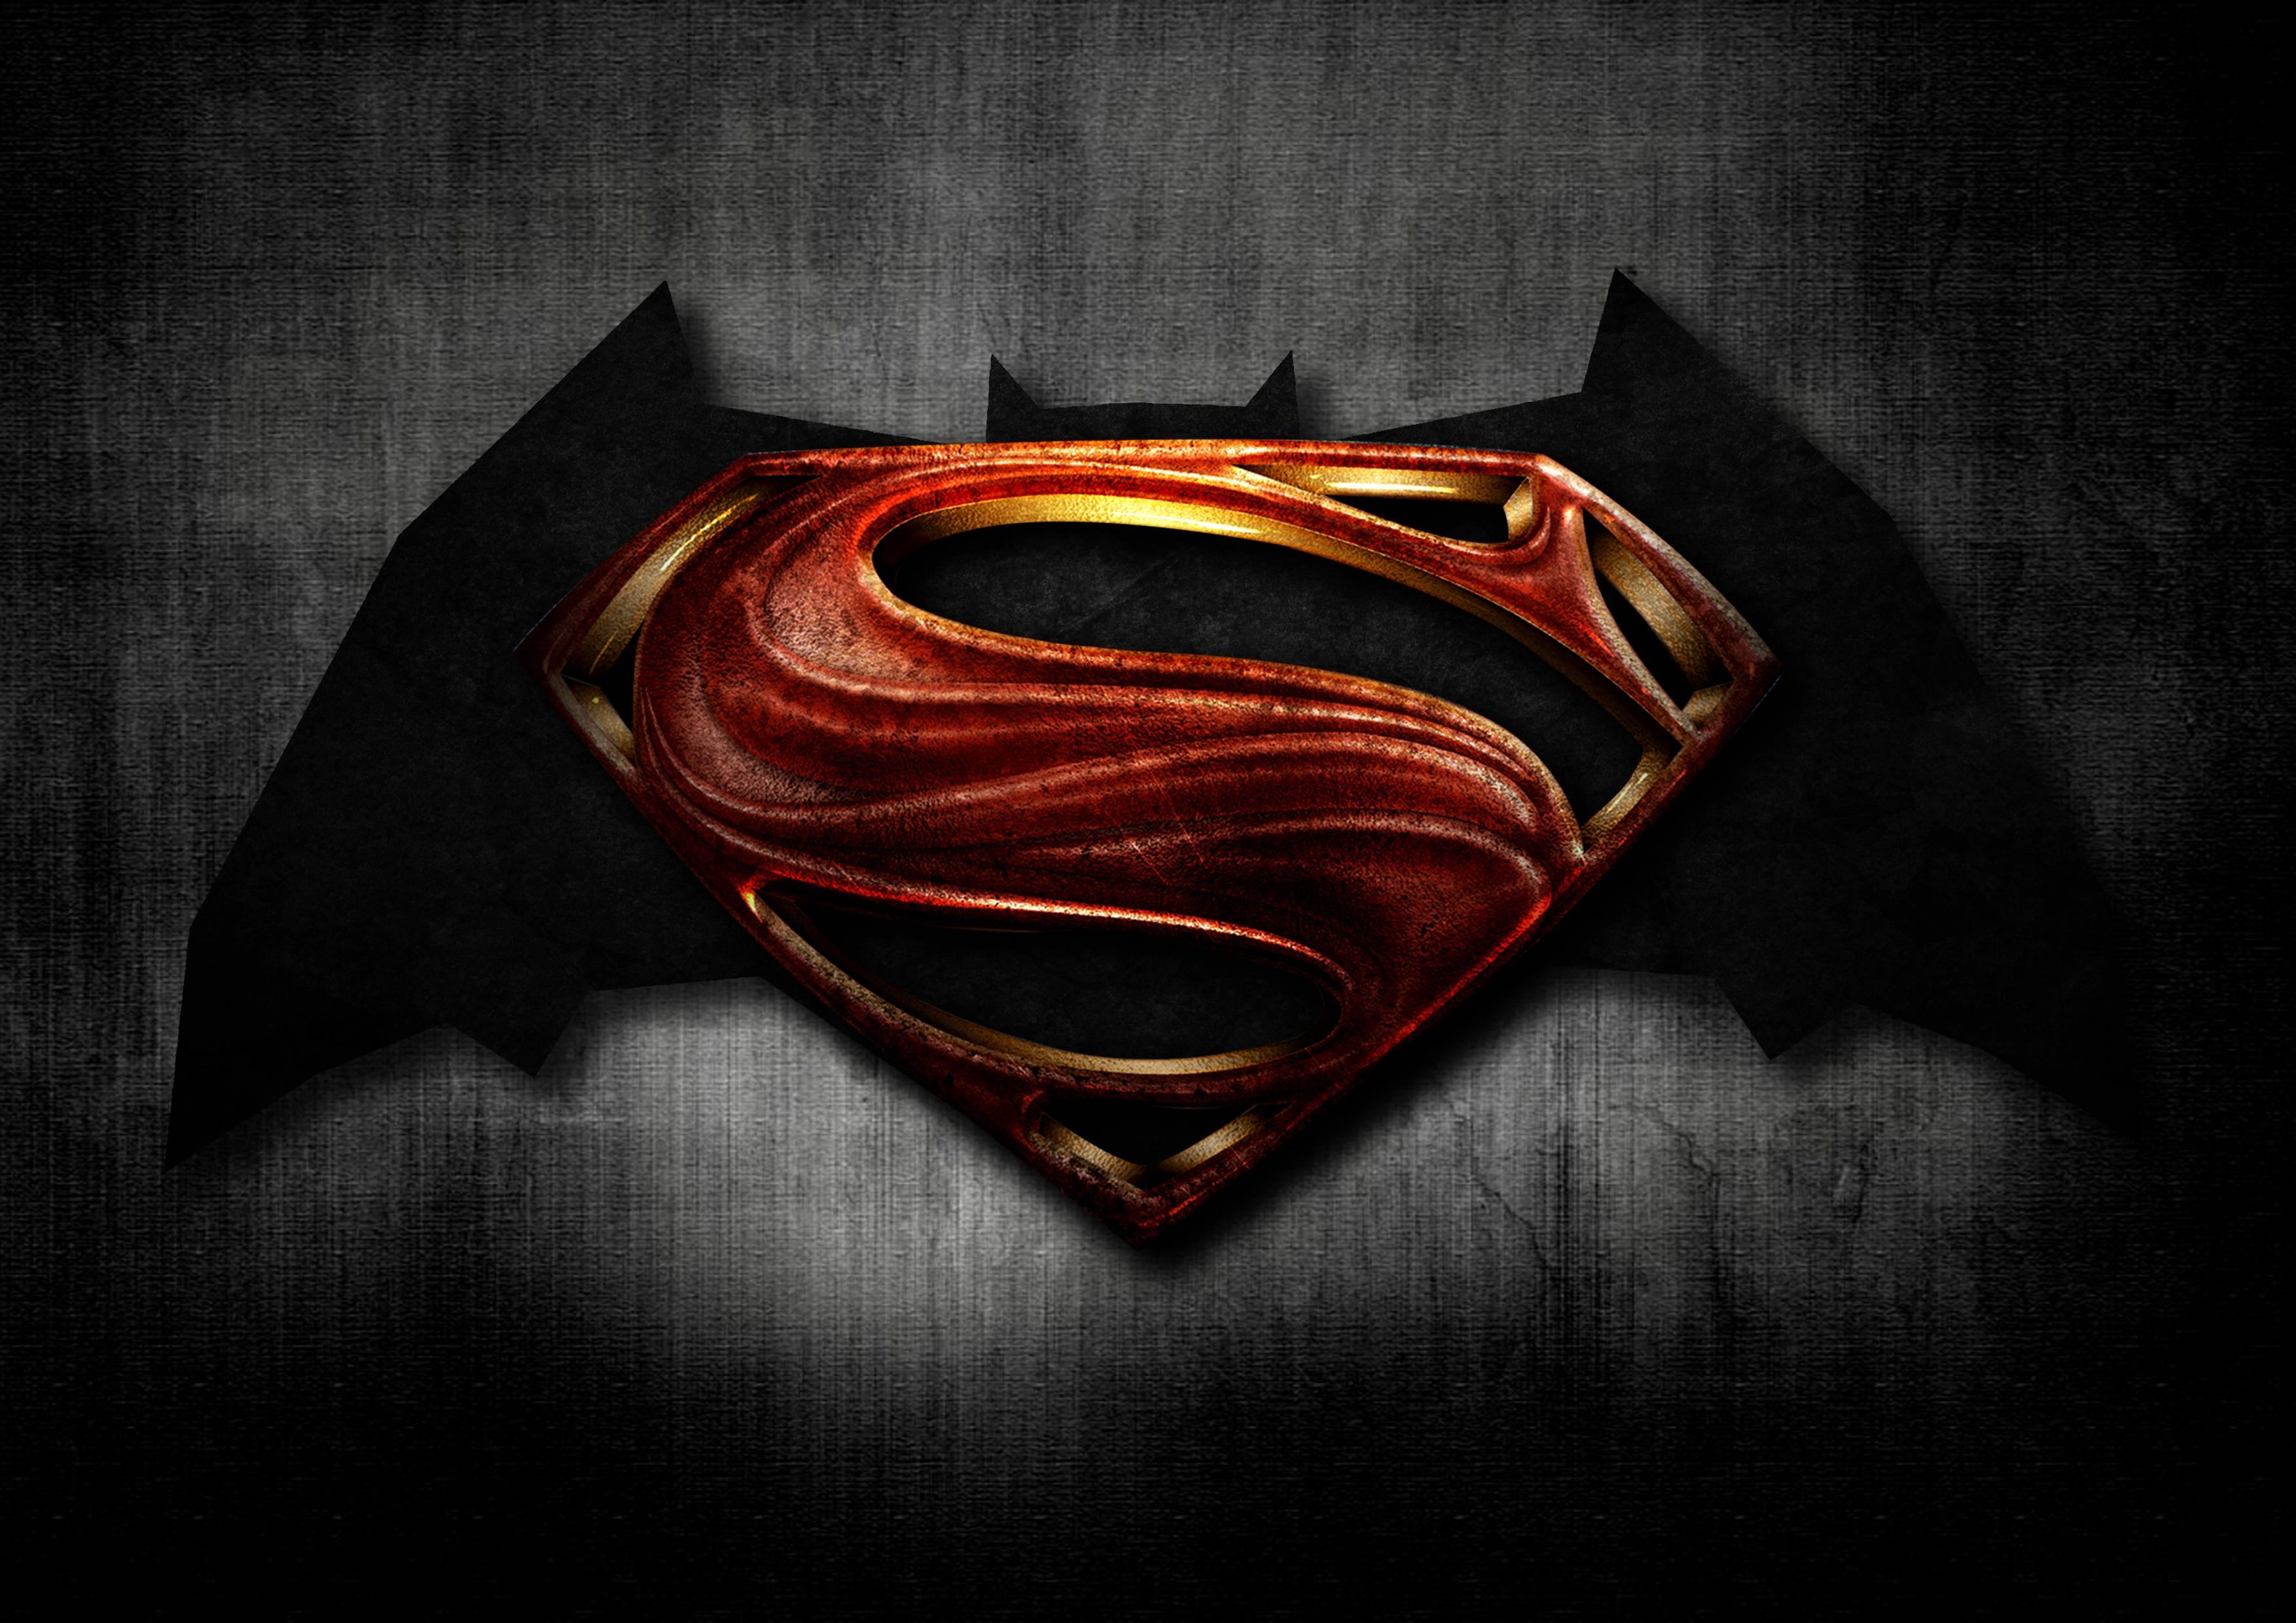 Superman logo ipad wallpapers hd